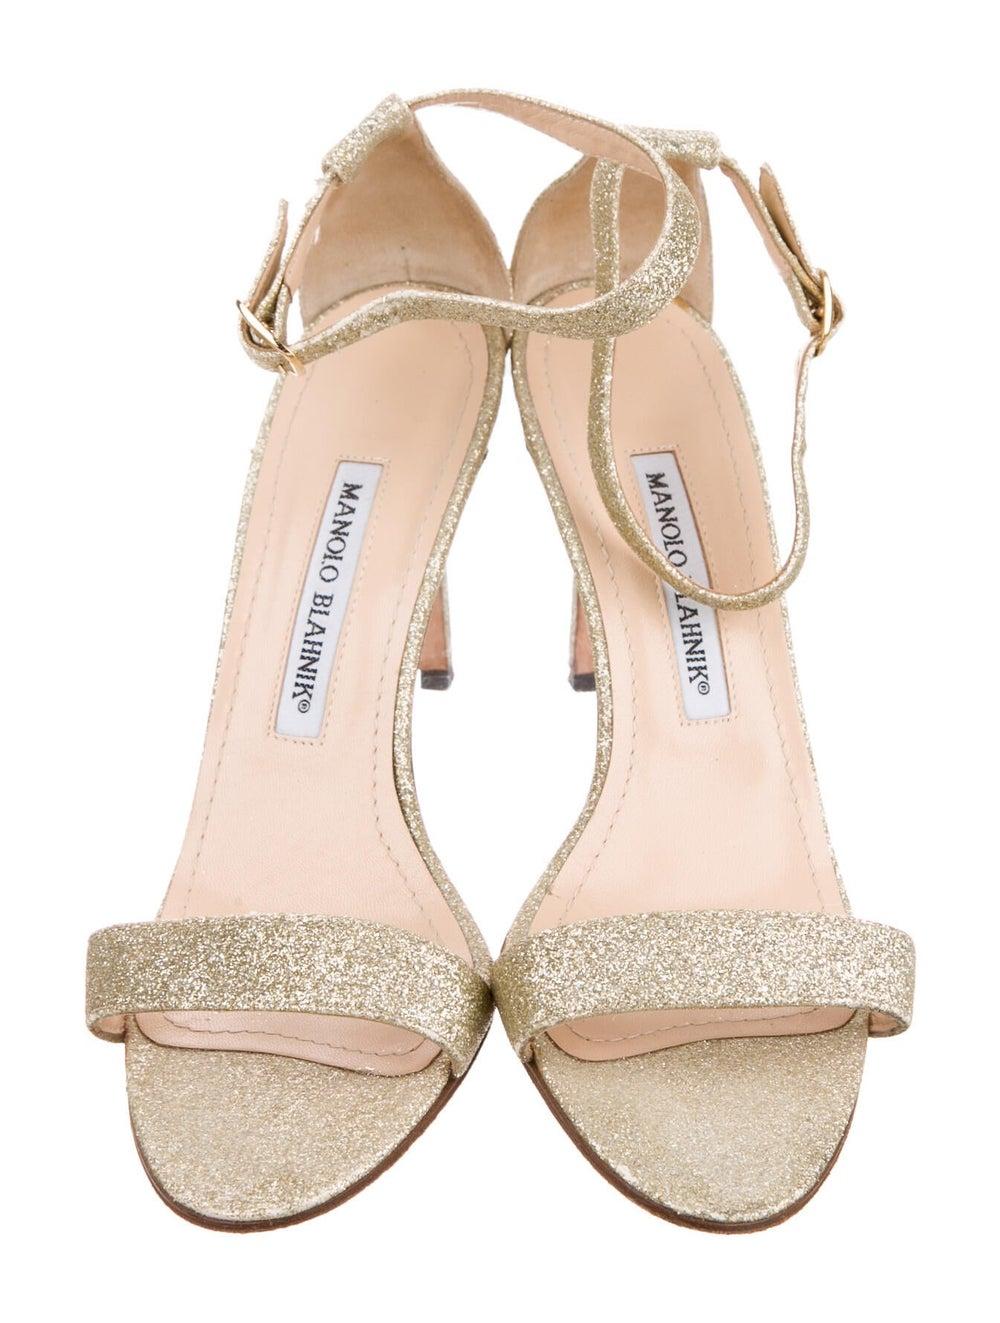 Manolo Blahnik Sandals Gold - image 3